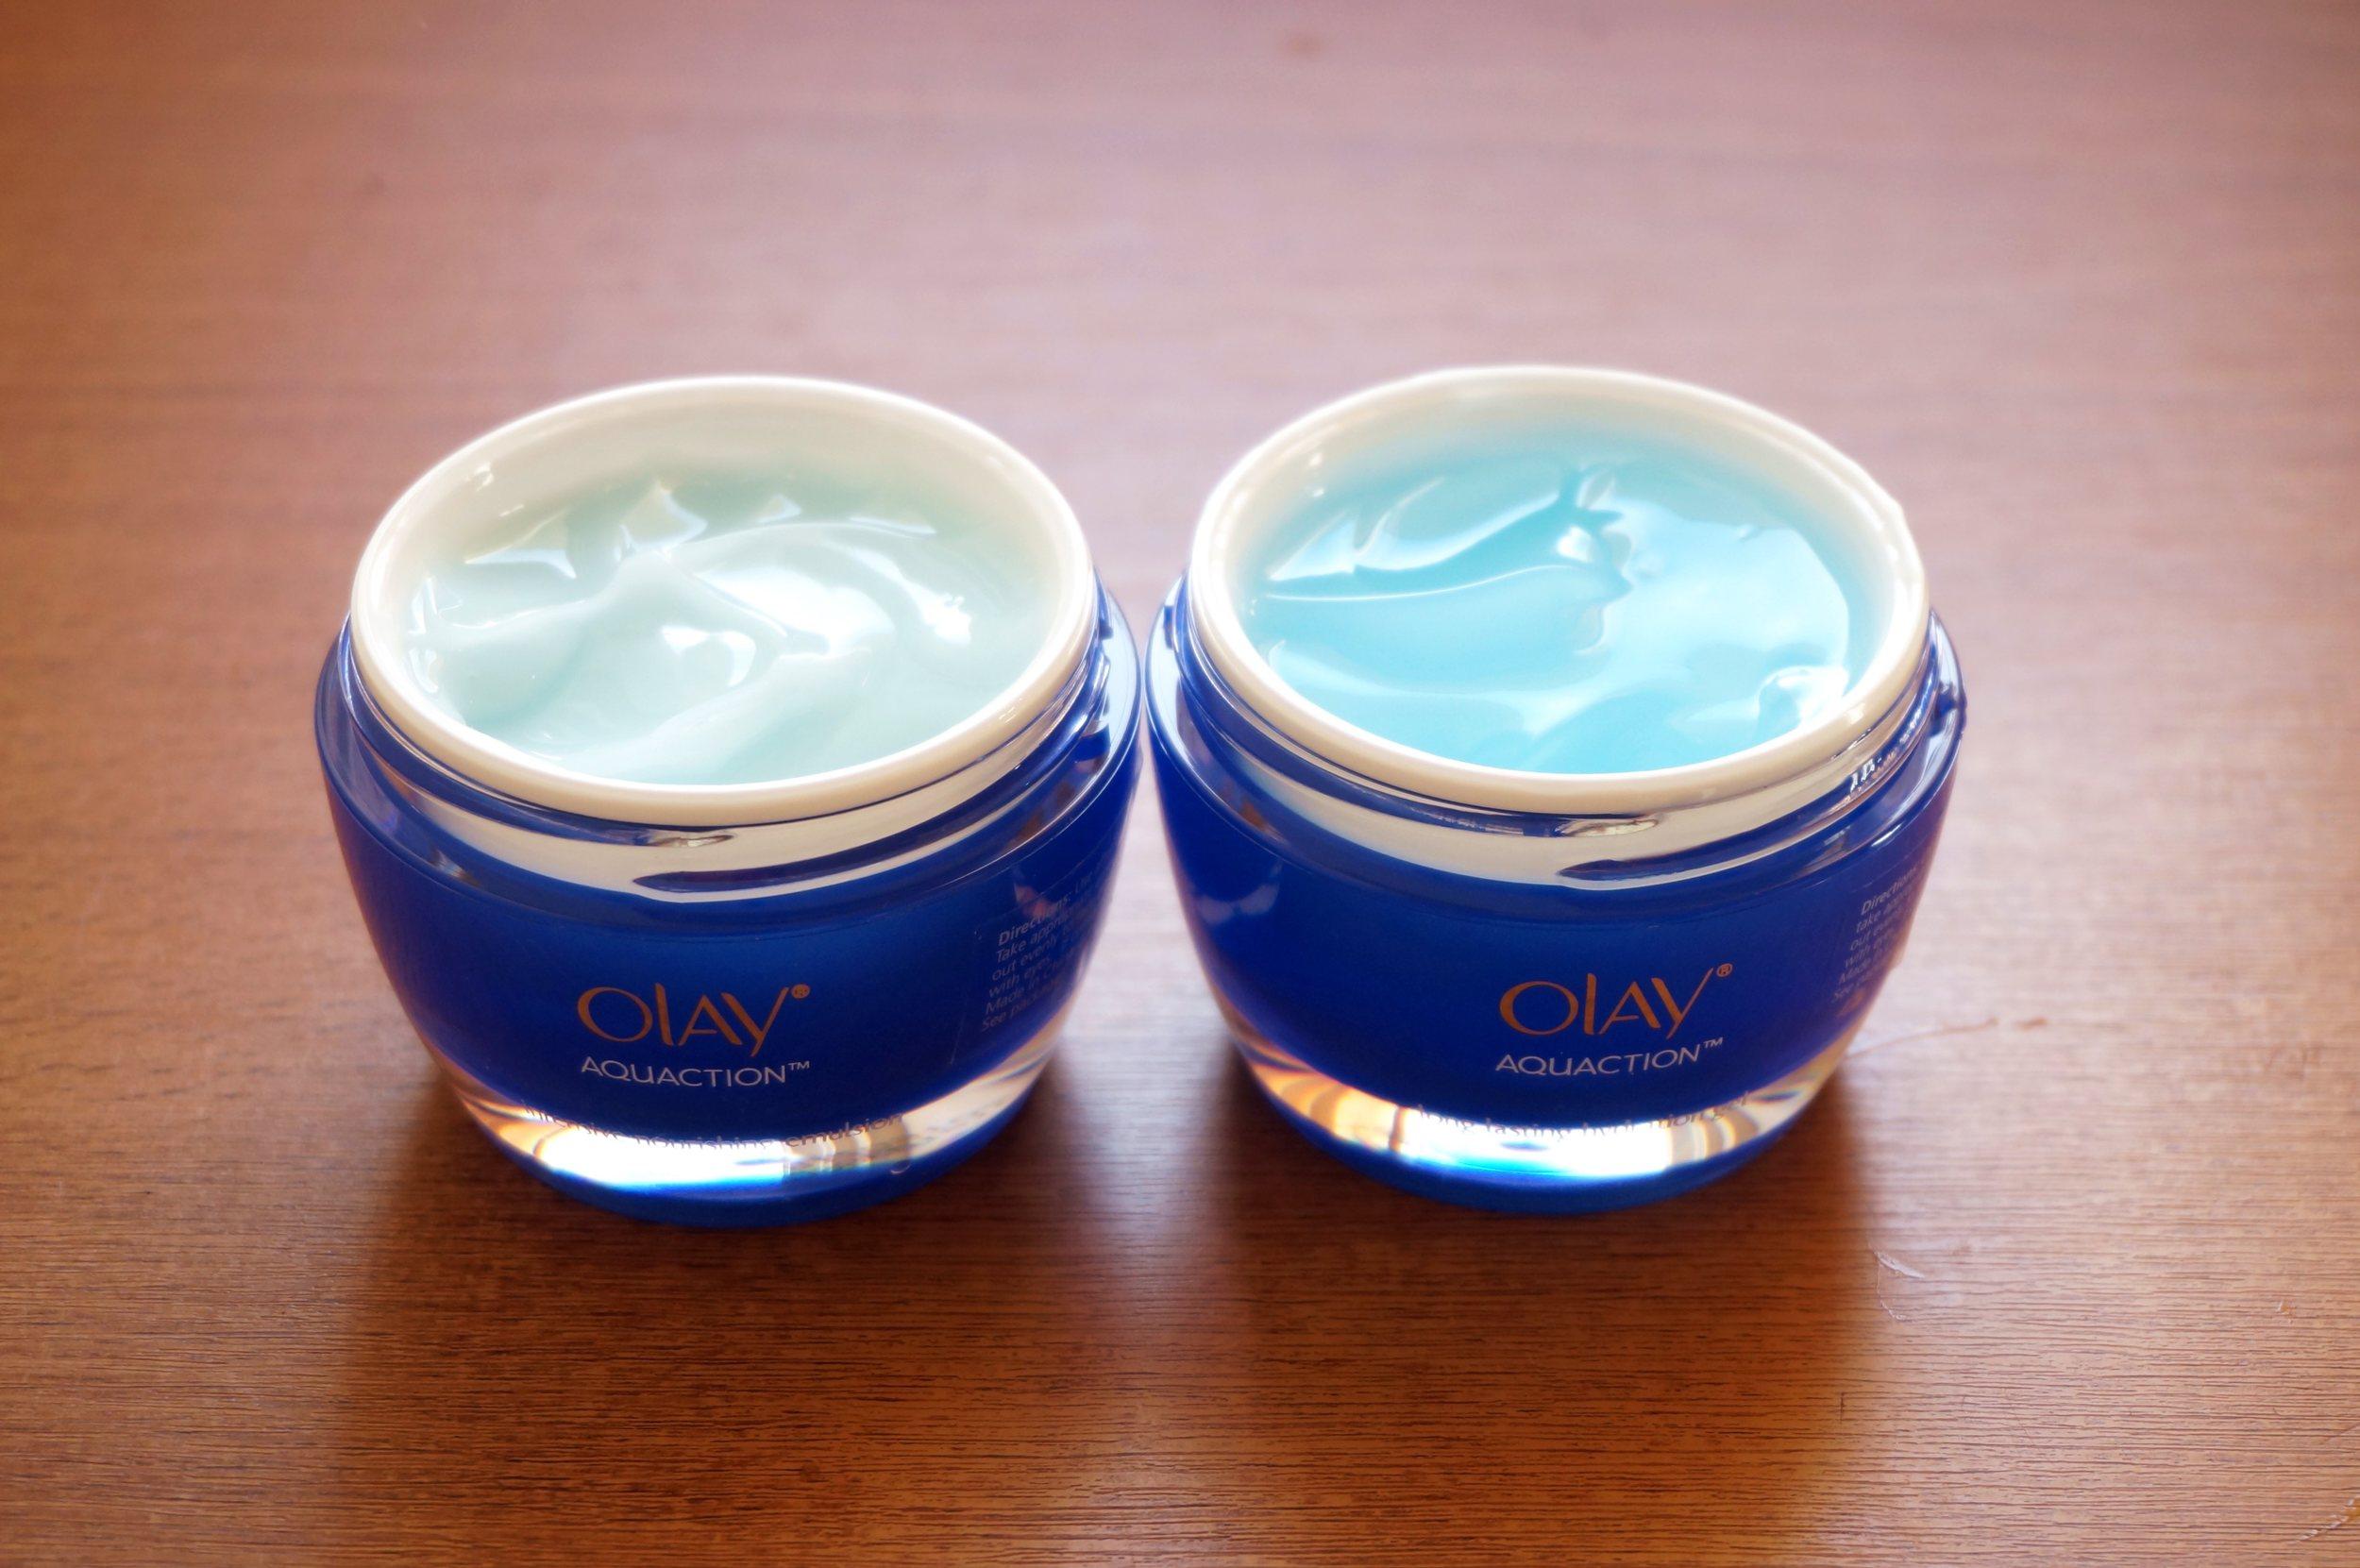 The Olay Aquaction Nourishing Emulsion and Olay Aquaction Softening Sleeping Mask & Long Lasting Hydration Gel